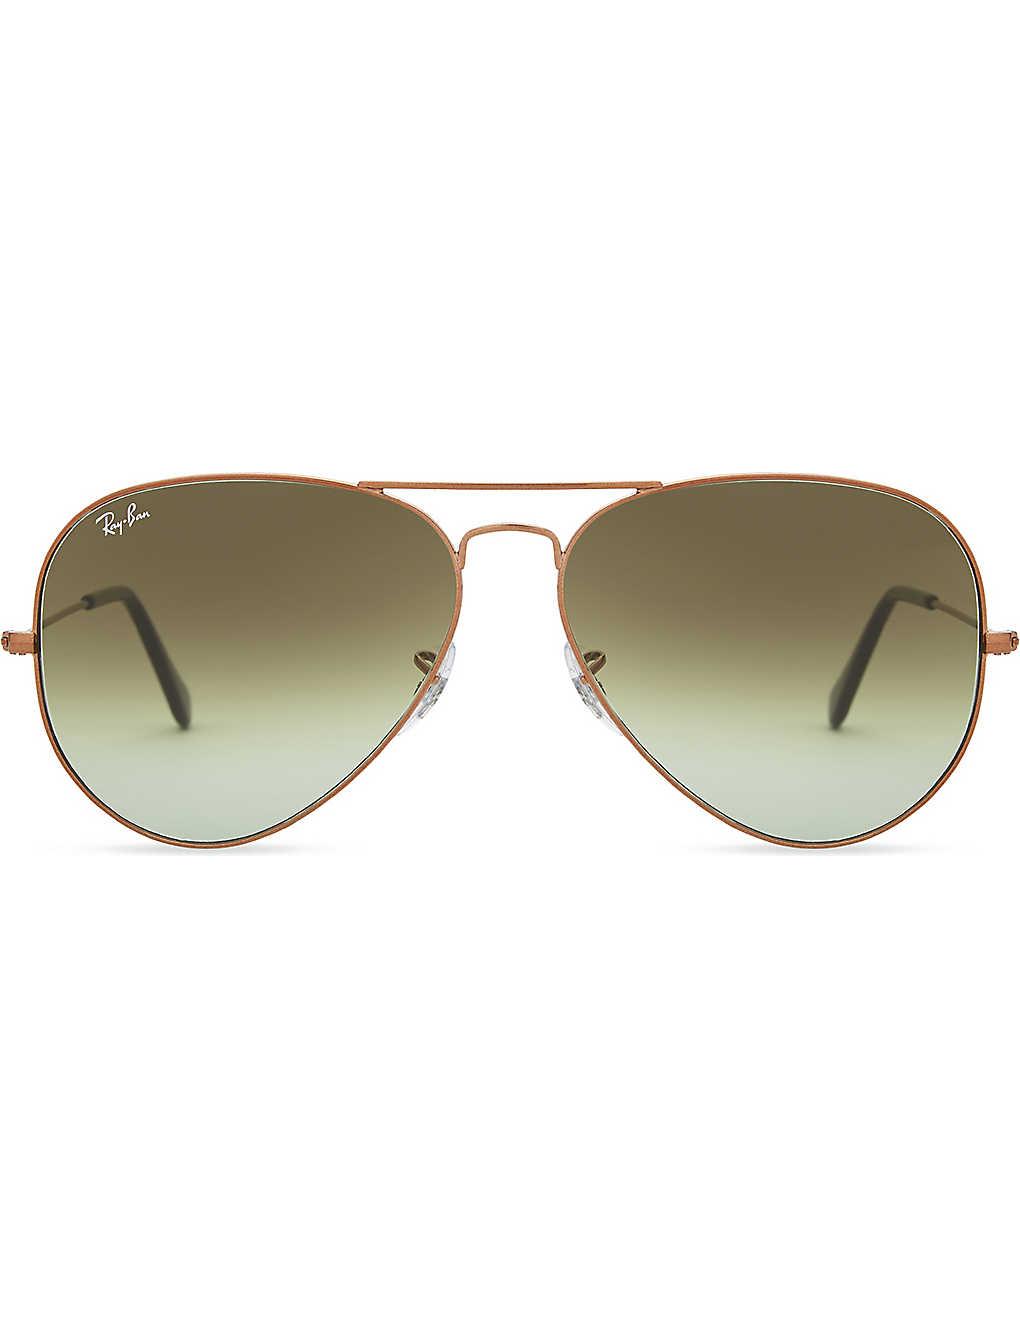 55cacb5405 RAY-BAN - Rb3026 aviator sunglasses